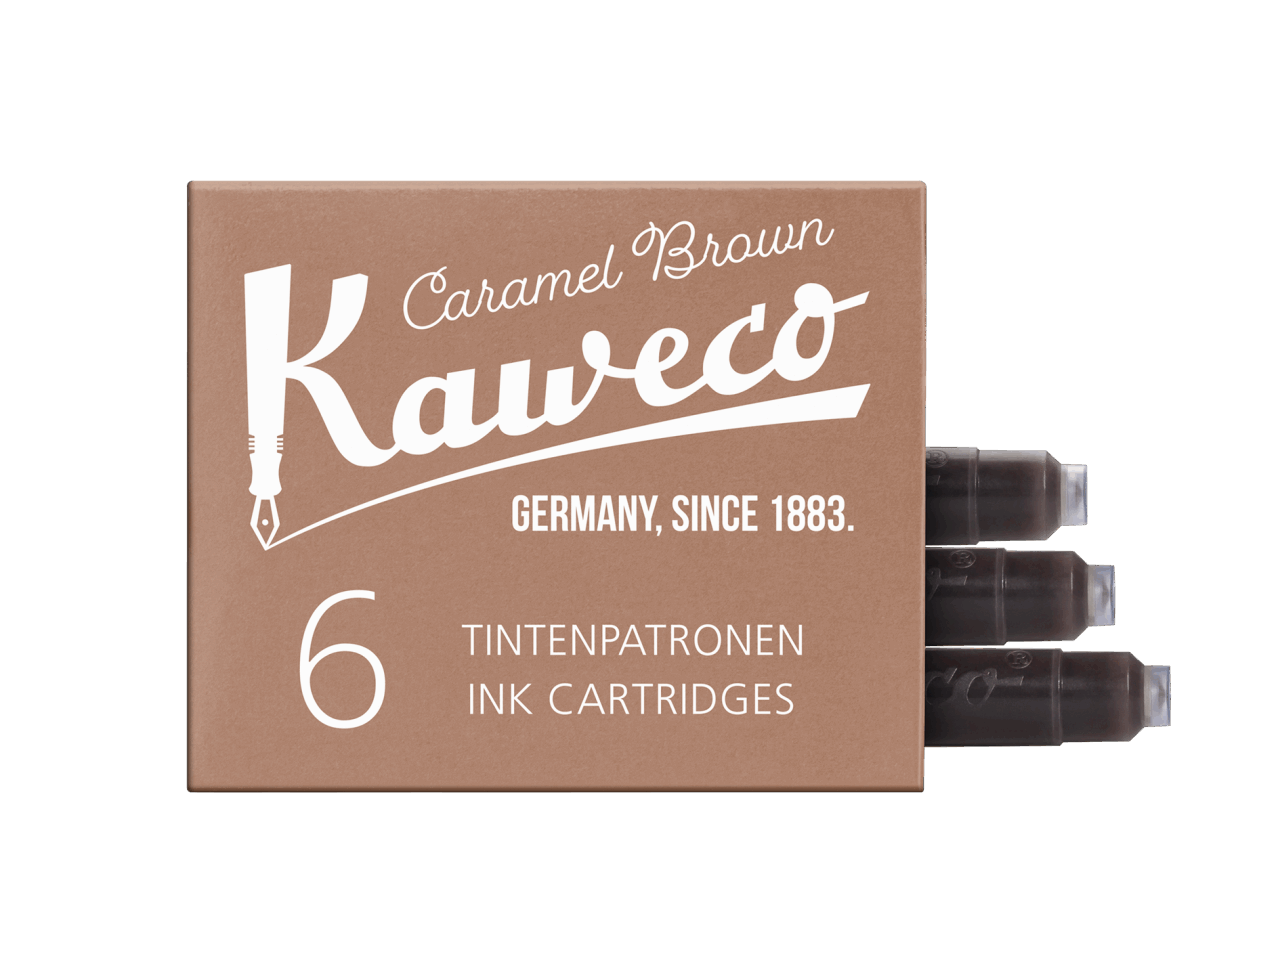 Kaweco Tintenpatronen 6 Stück - Karamel Braun